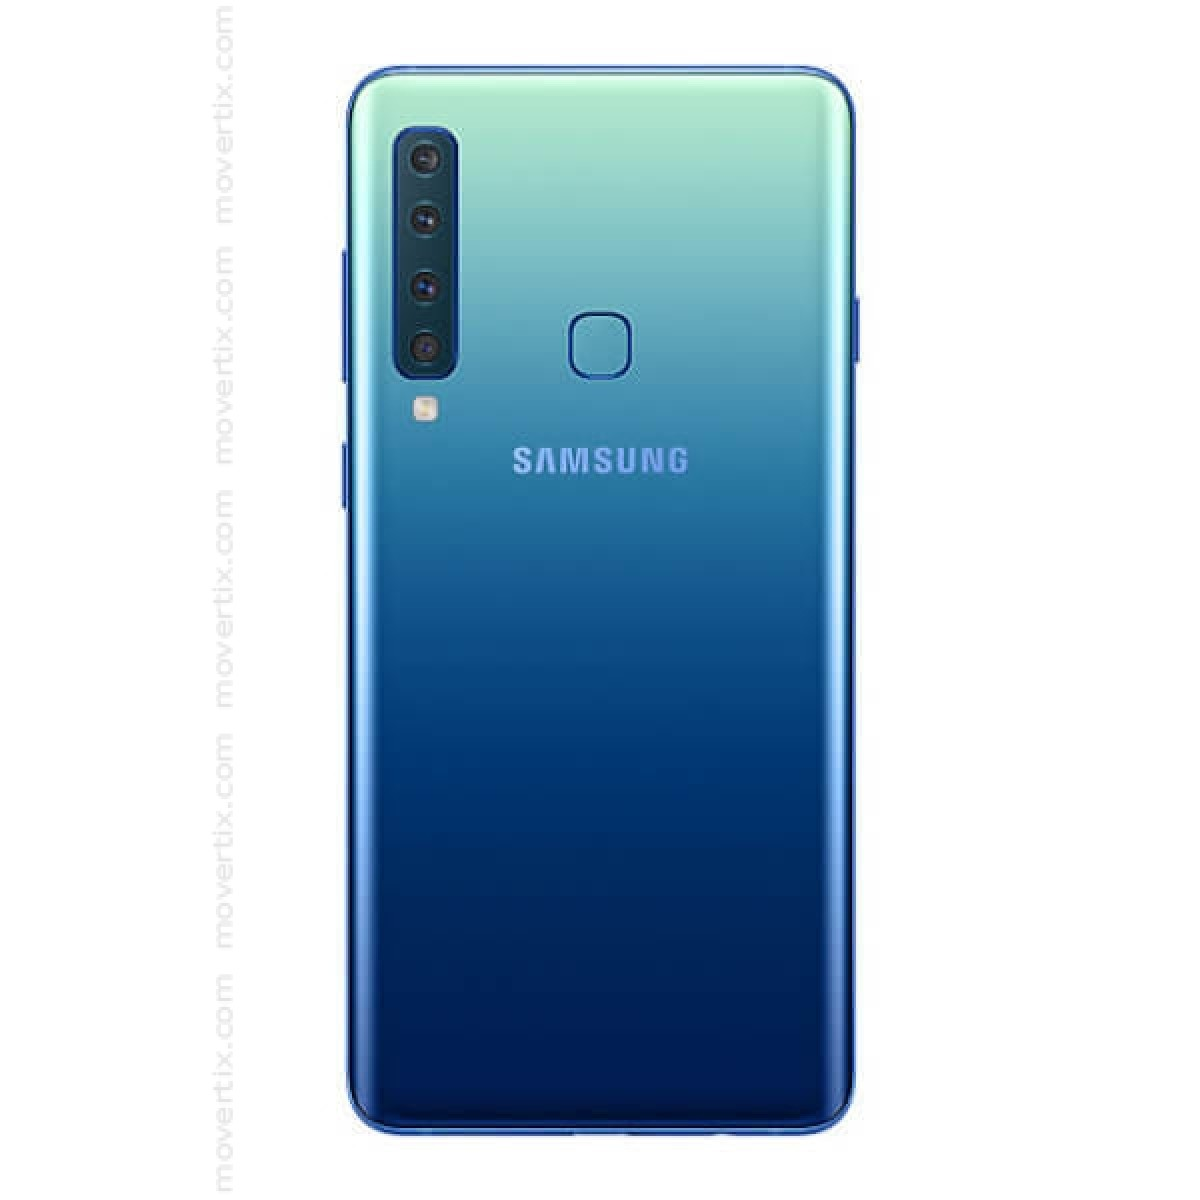 Samsung Galaxy A9 2018 Double Sim Bleu Avec 128go Et 6go Ram Sm